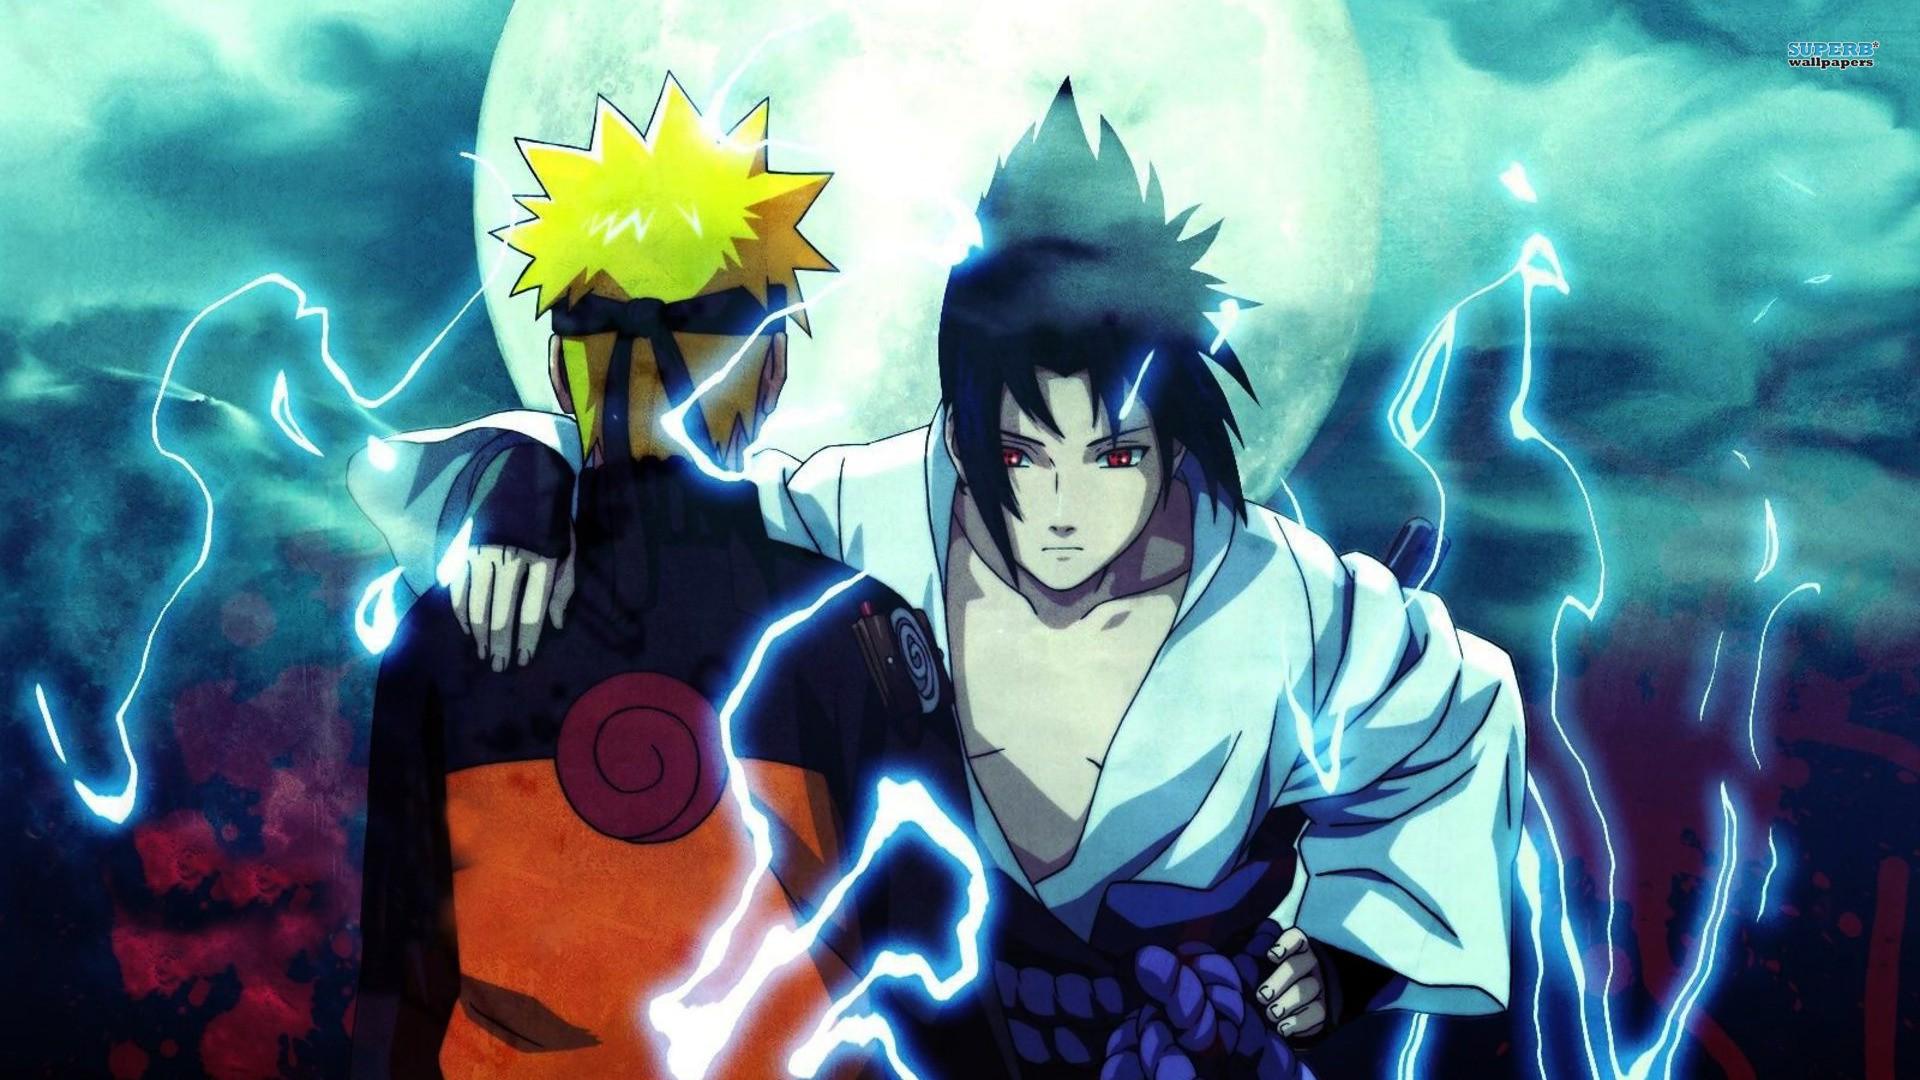 Naruto Full HD Wallpapers Group (92+)